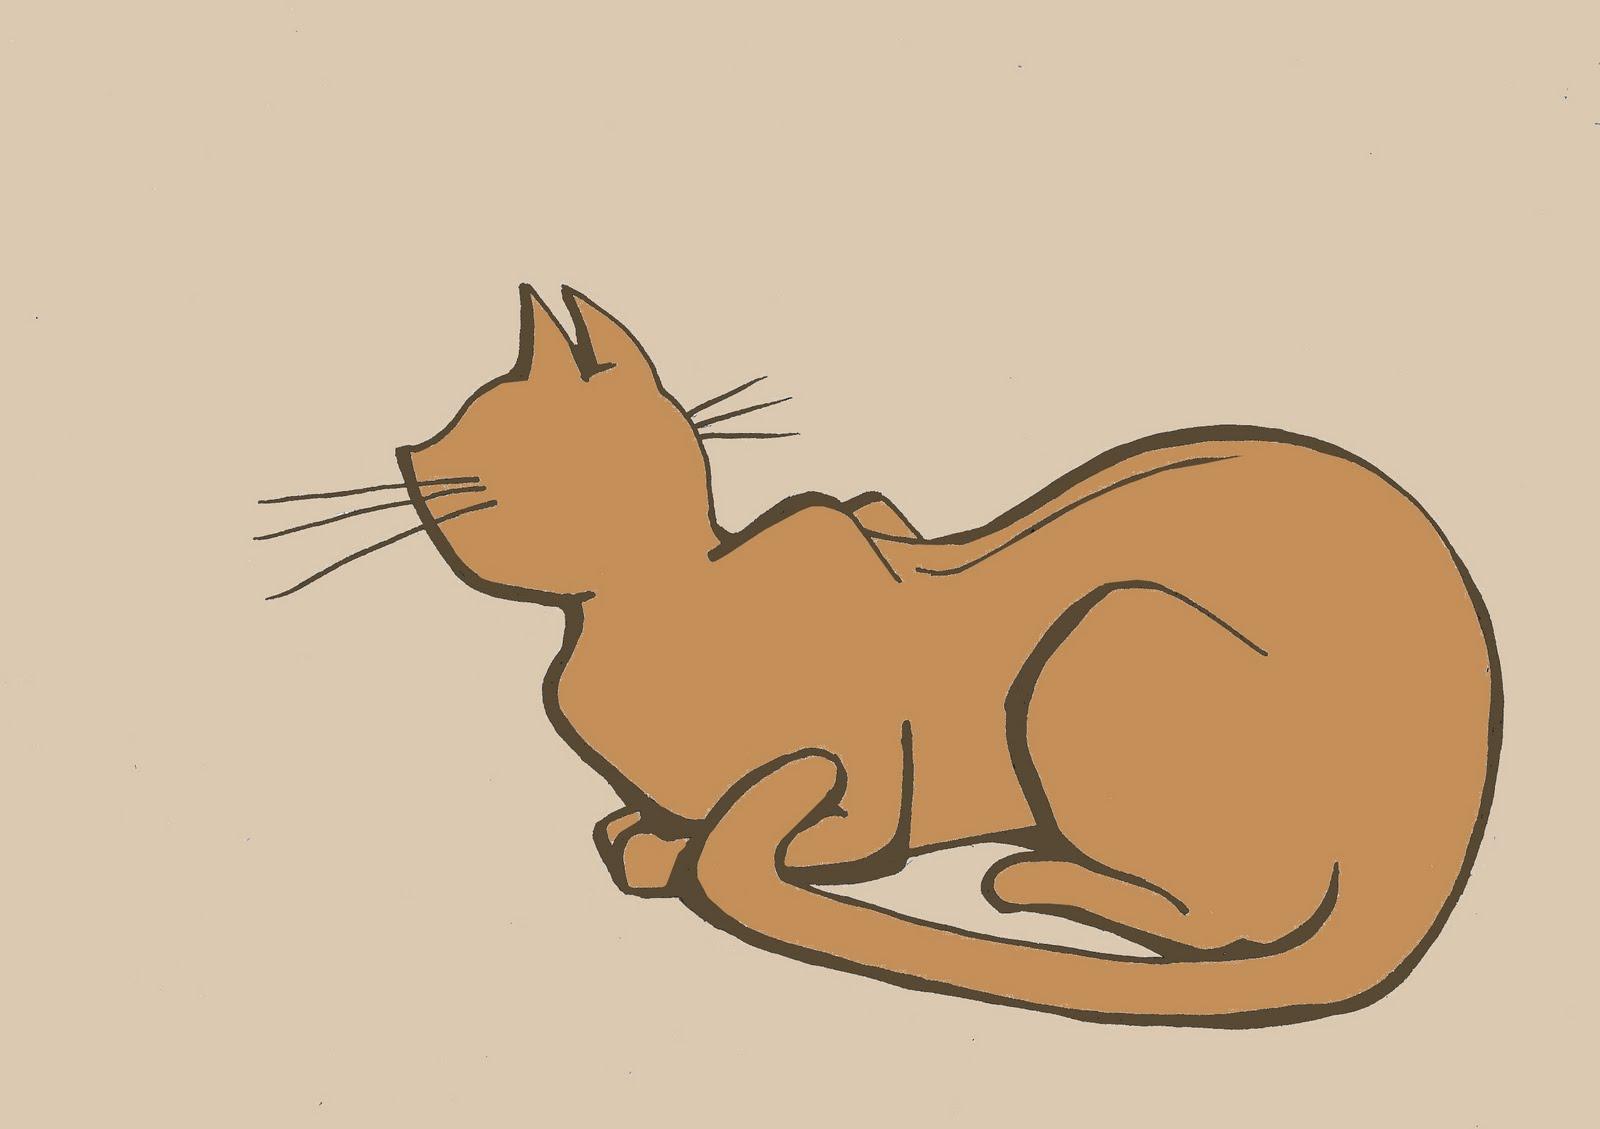 pet rat and cat